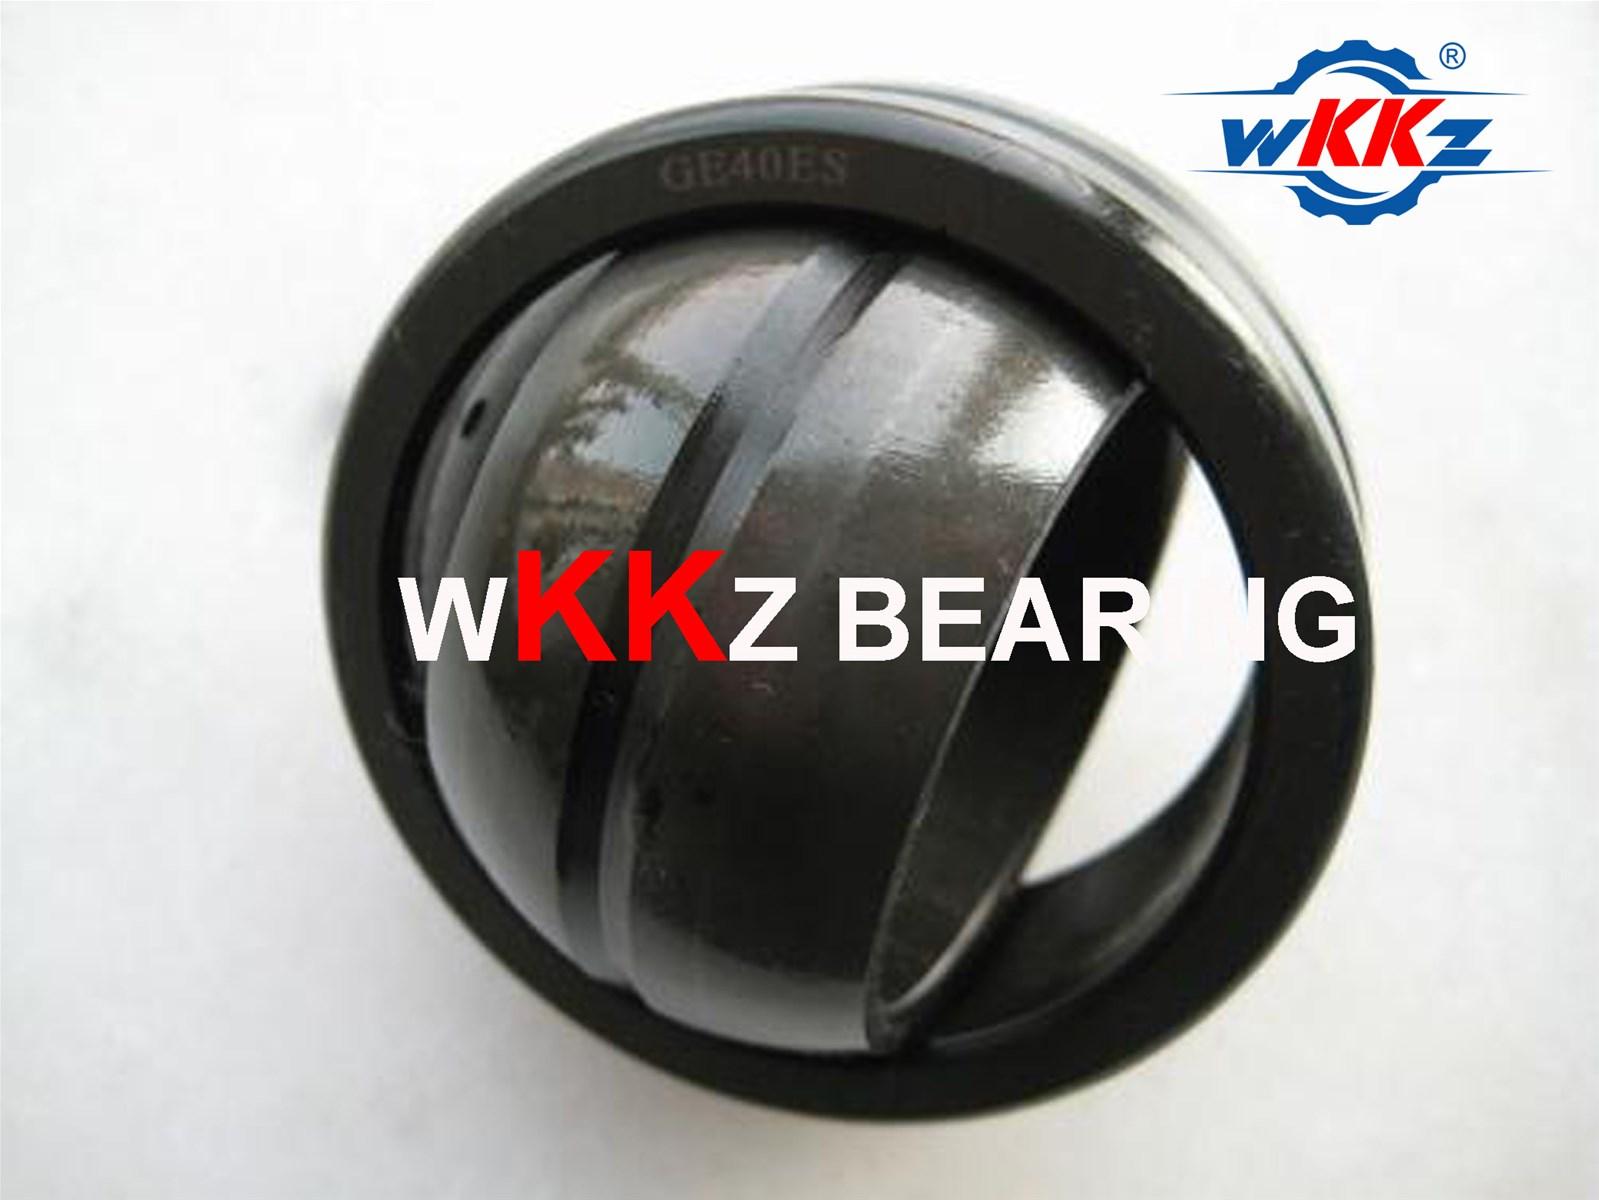 GE80ESGE80DO Radial spherical plain bearingsWKKZ BEARINGCHINA BEARING